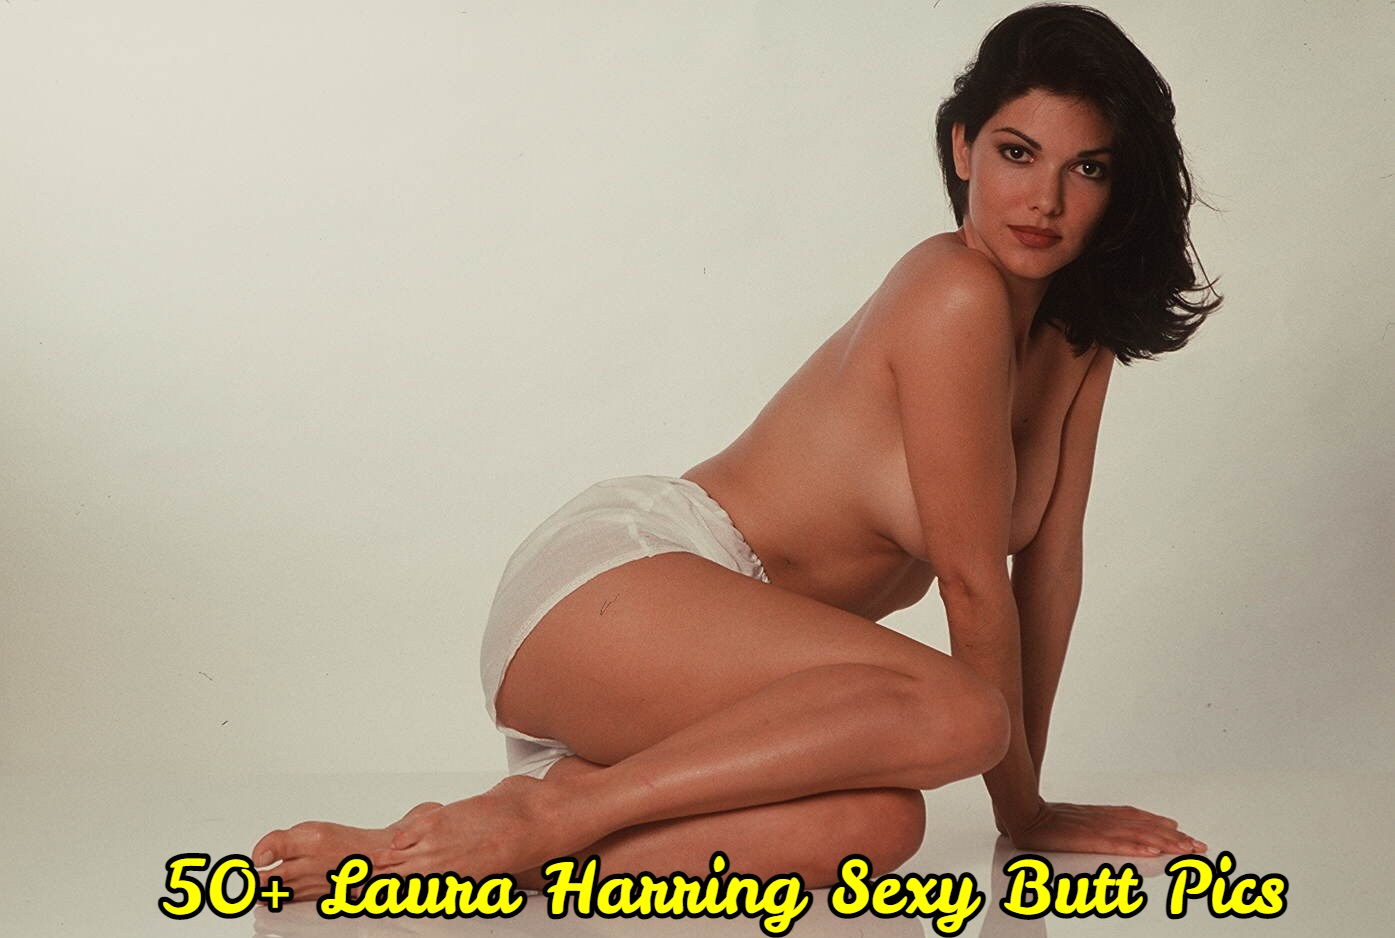 Laura Harring Sexy Butt Pics